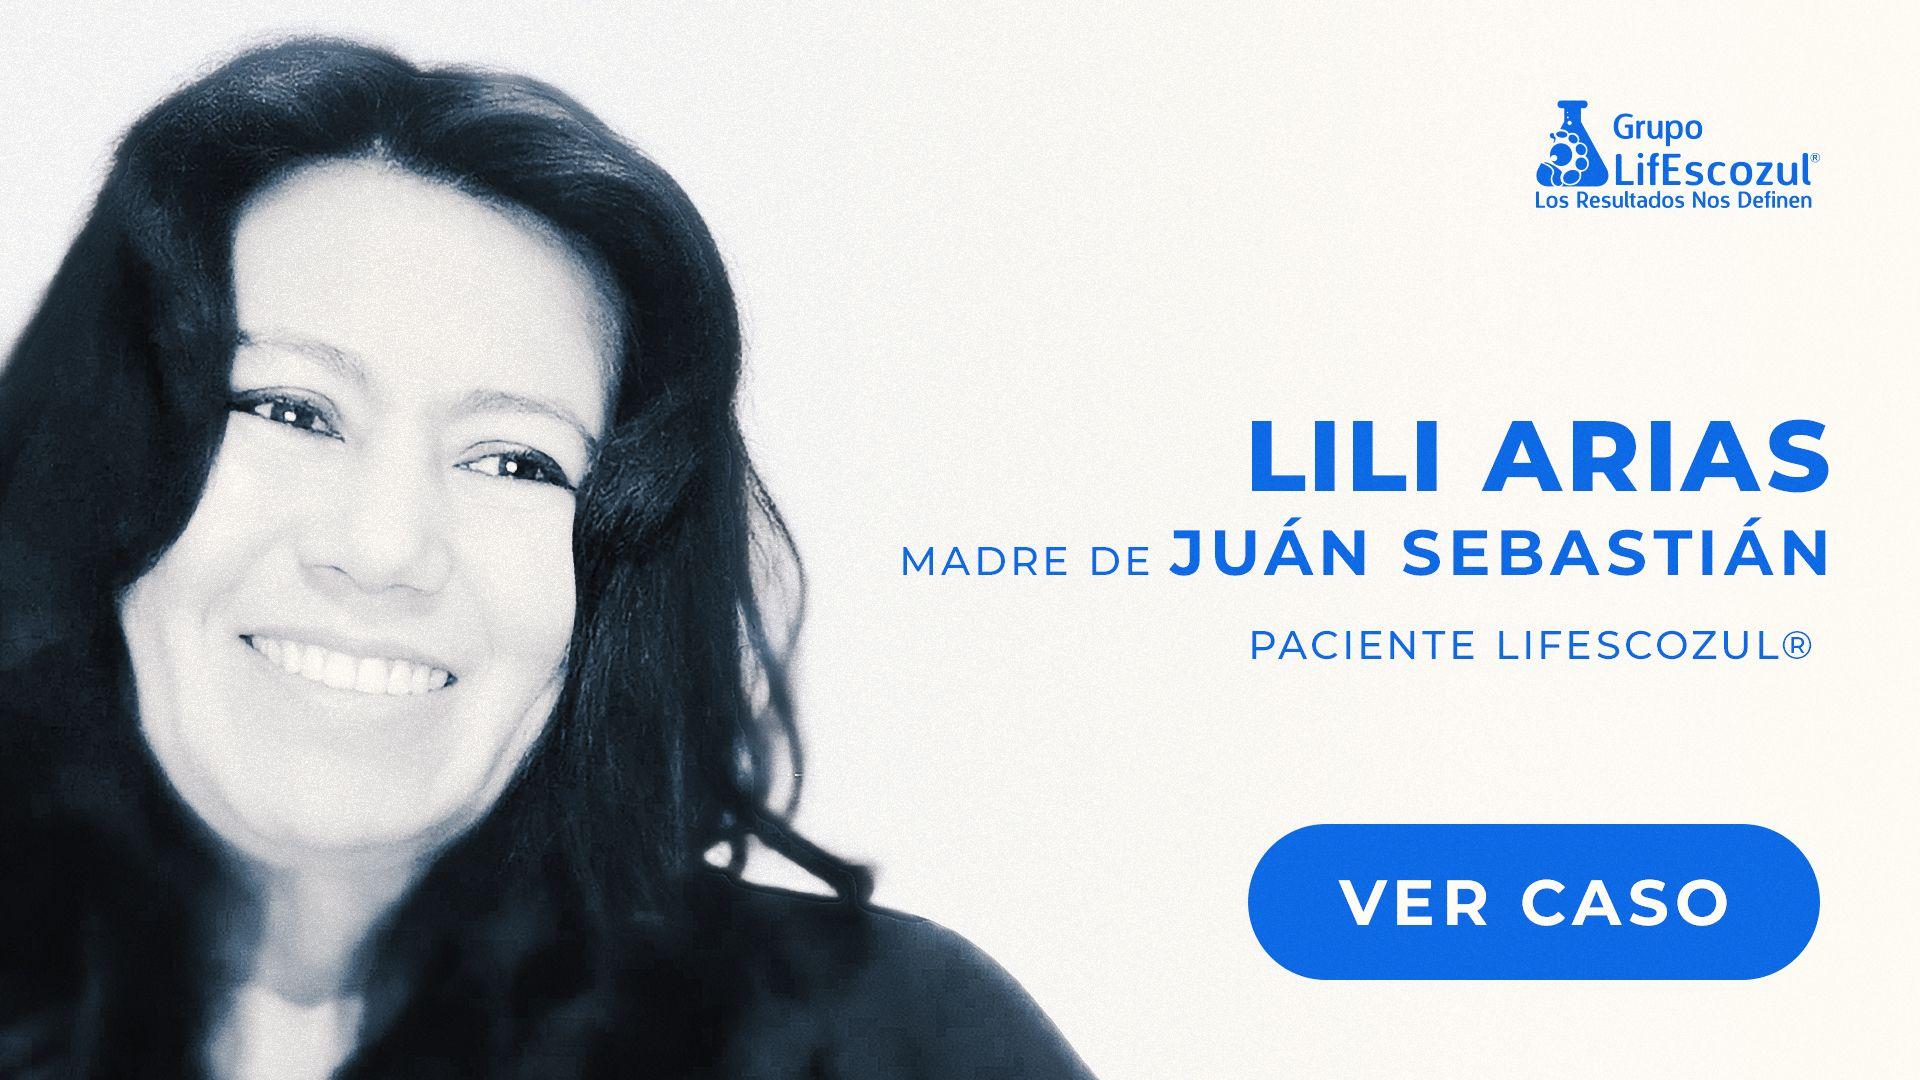 Juan Sebastián - LifEscozul®